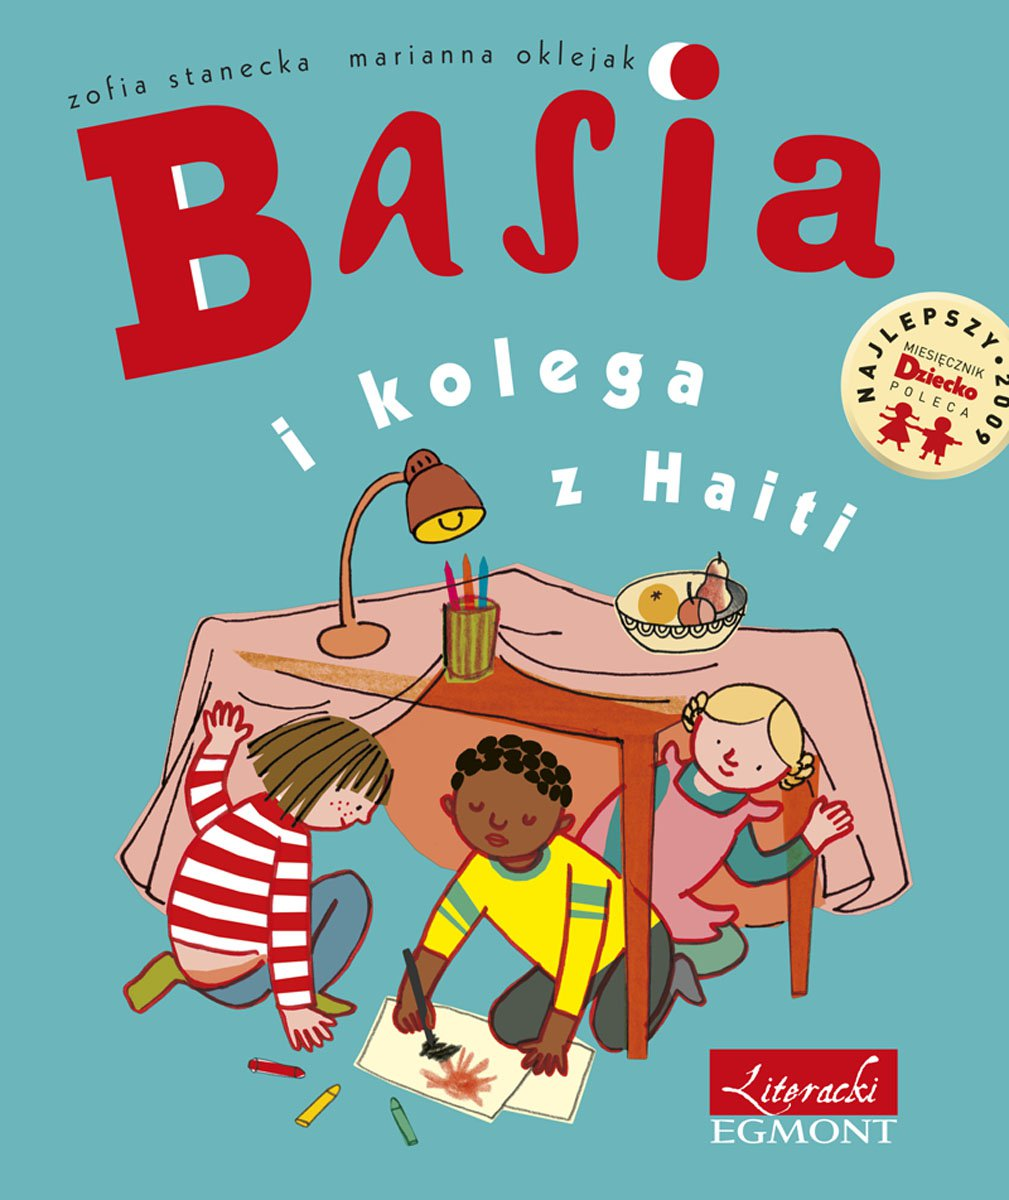 Basia i kolega z Haiti - Ebook (Książka EPUB) do pobrania w formacie EPUB